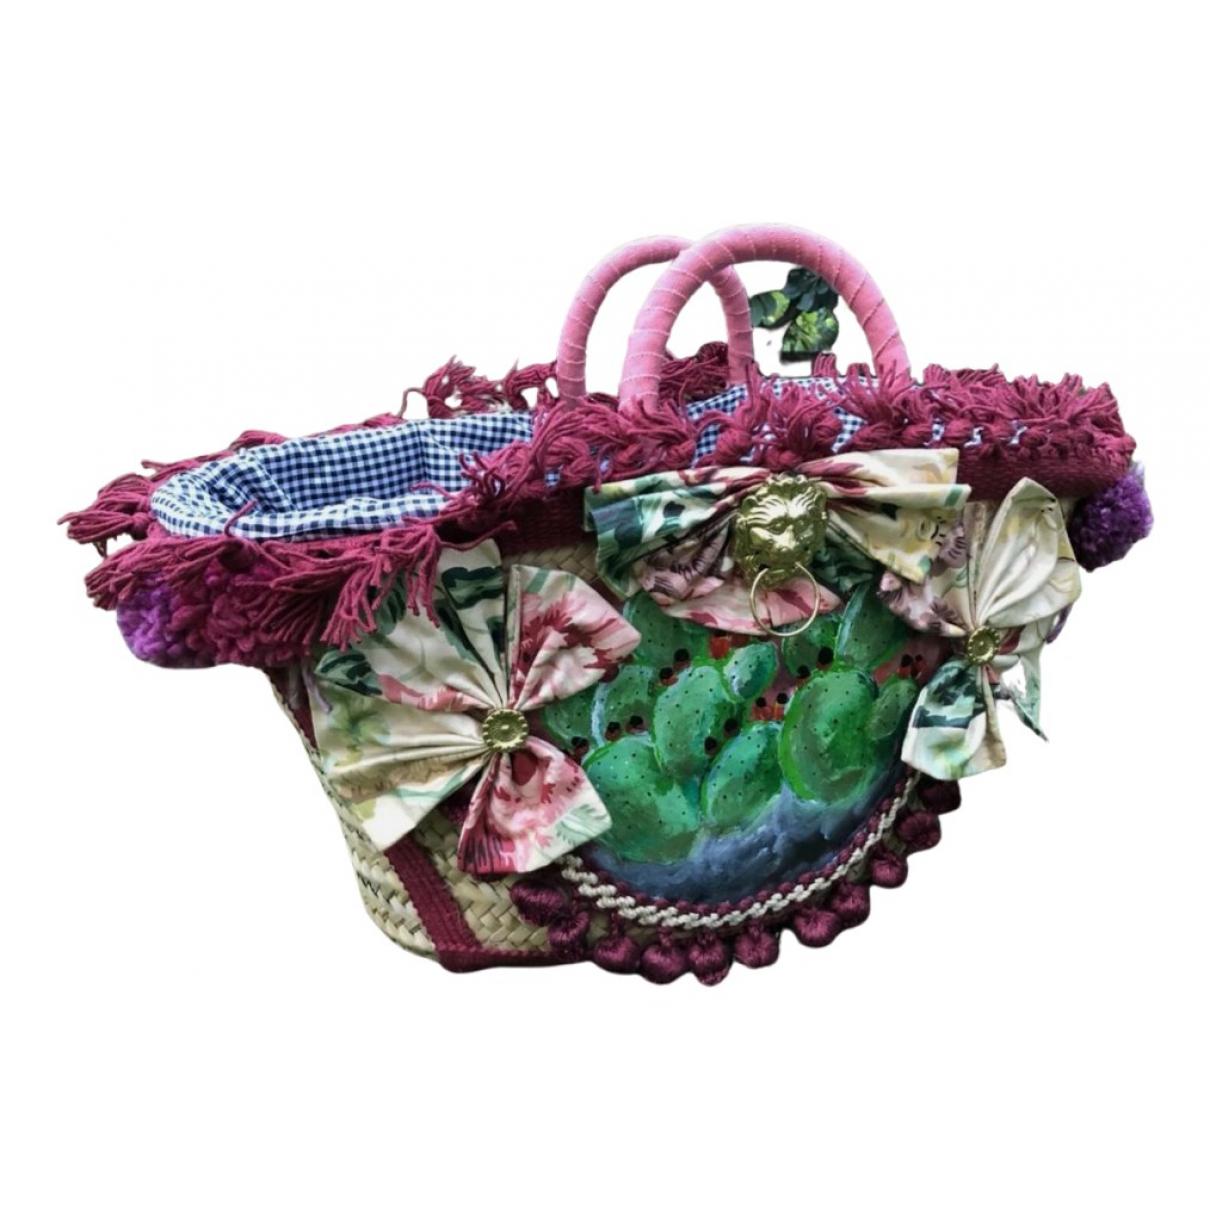 Dolce & Gabbana N Multicolour Wicker handbag for Women N